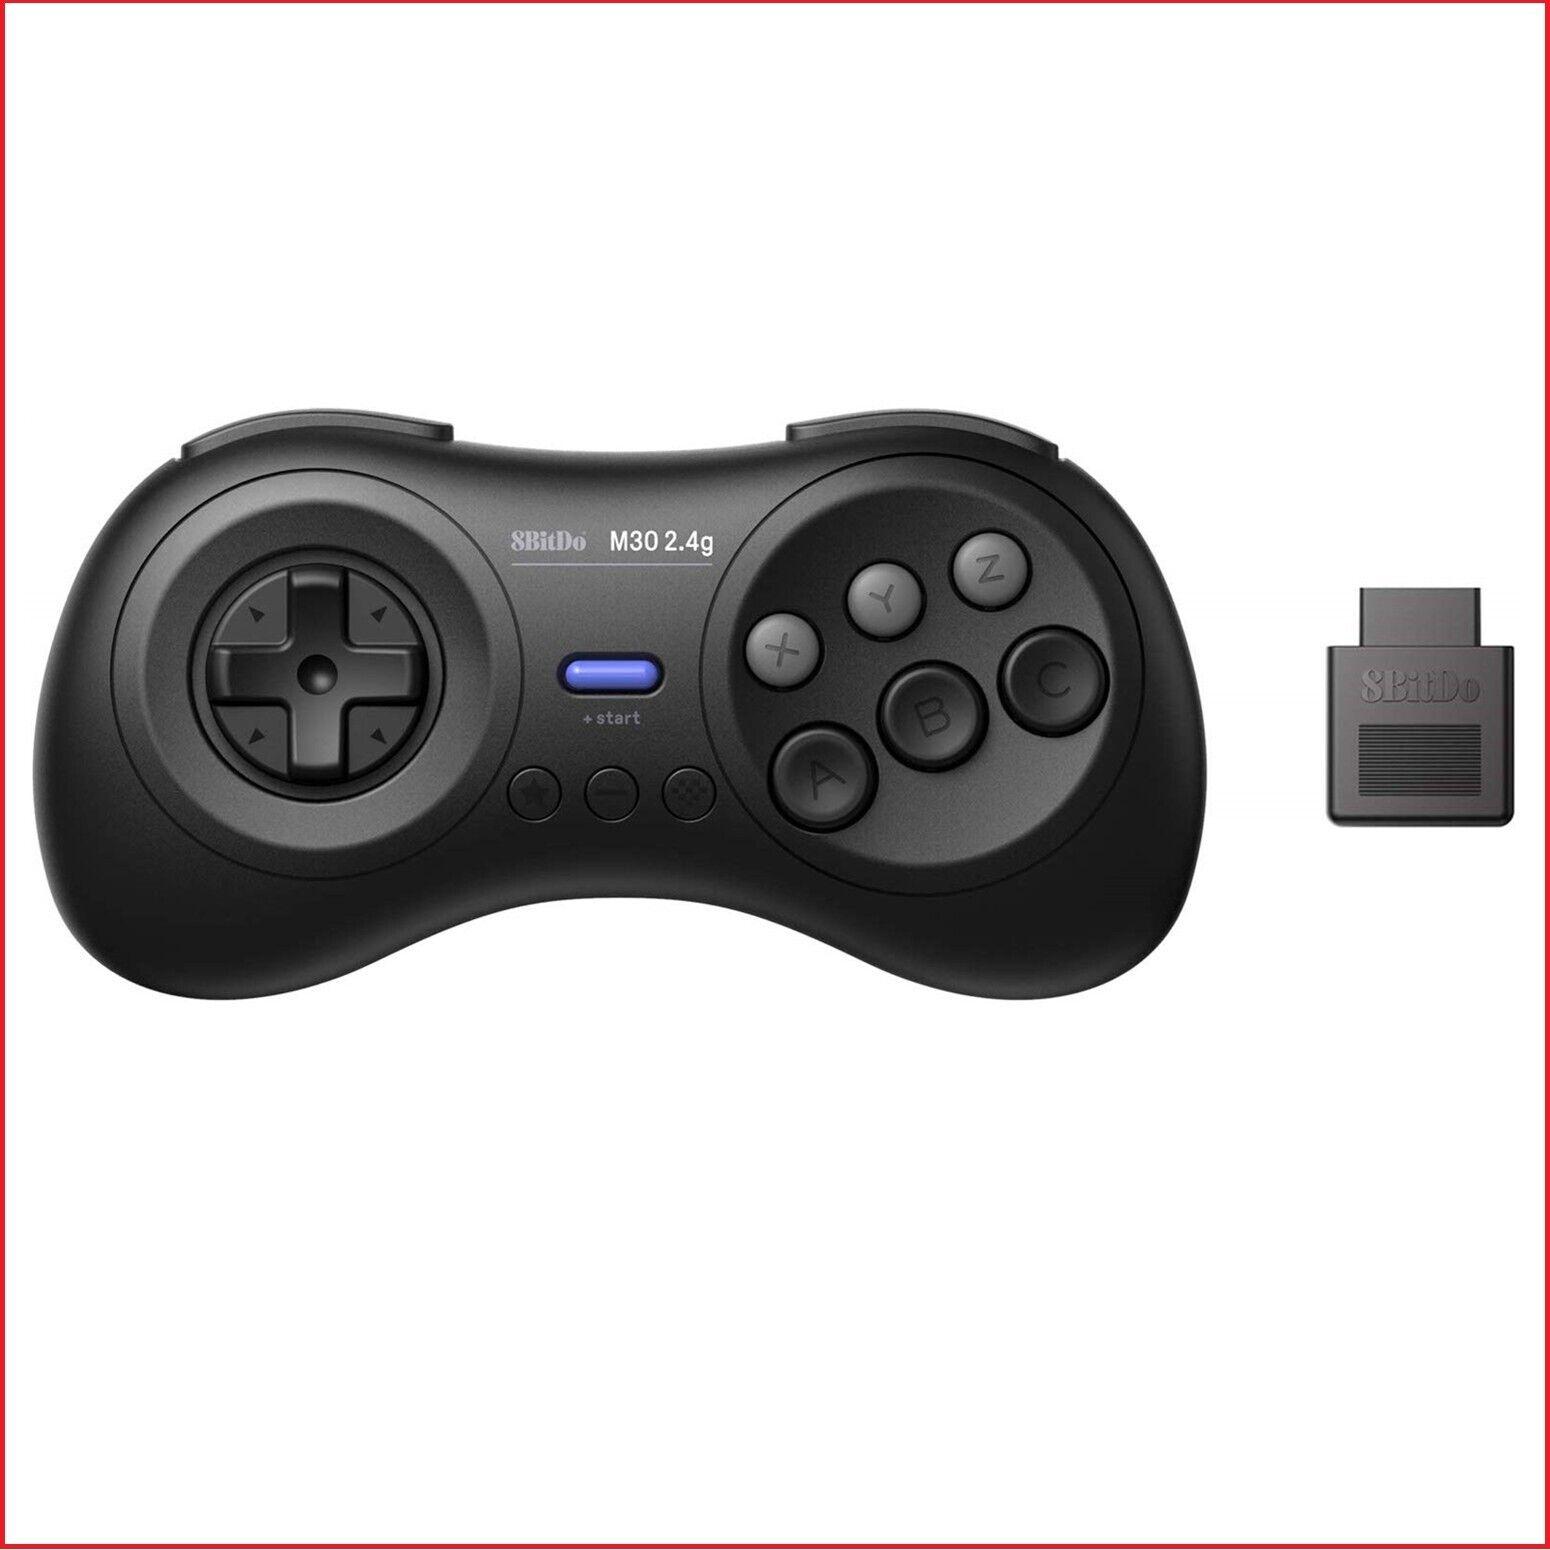 8Bitdo M30 2.4G Wireless Gamepad For The Original Sega Genesis & Sega Mega Drive Controllers & Attachments